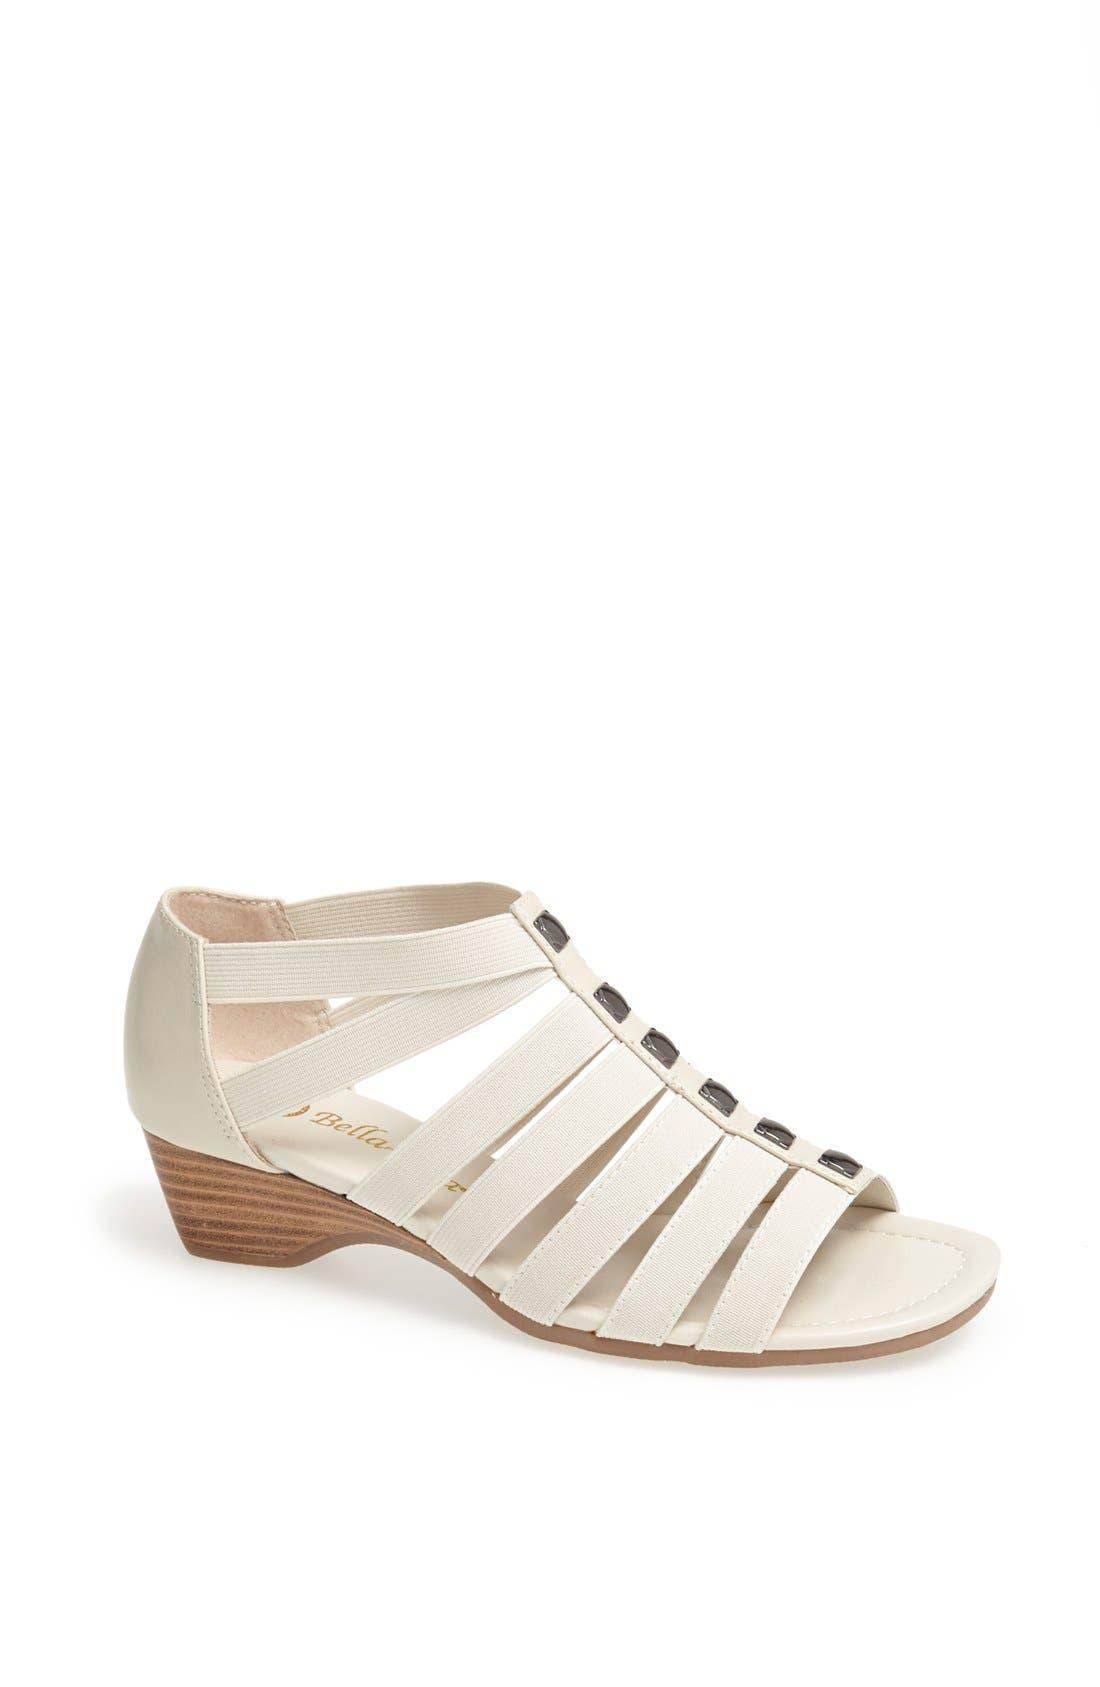 Main Image - Bella Vita 'Paula II' Sandal